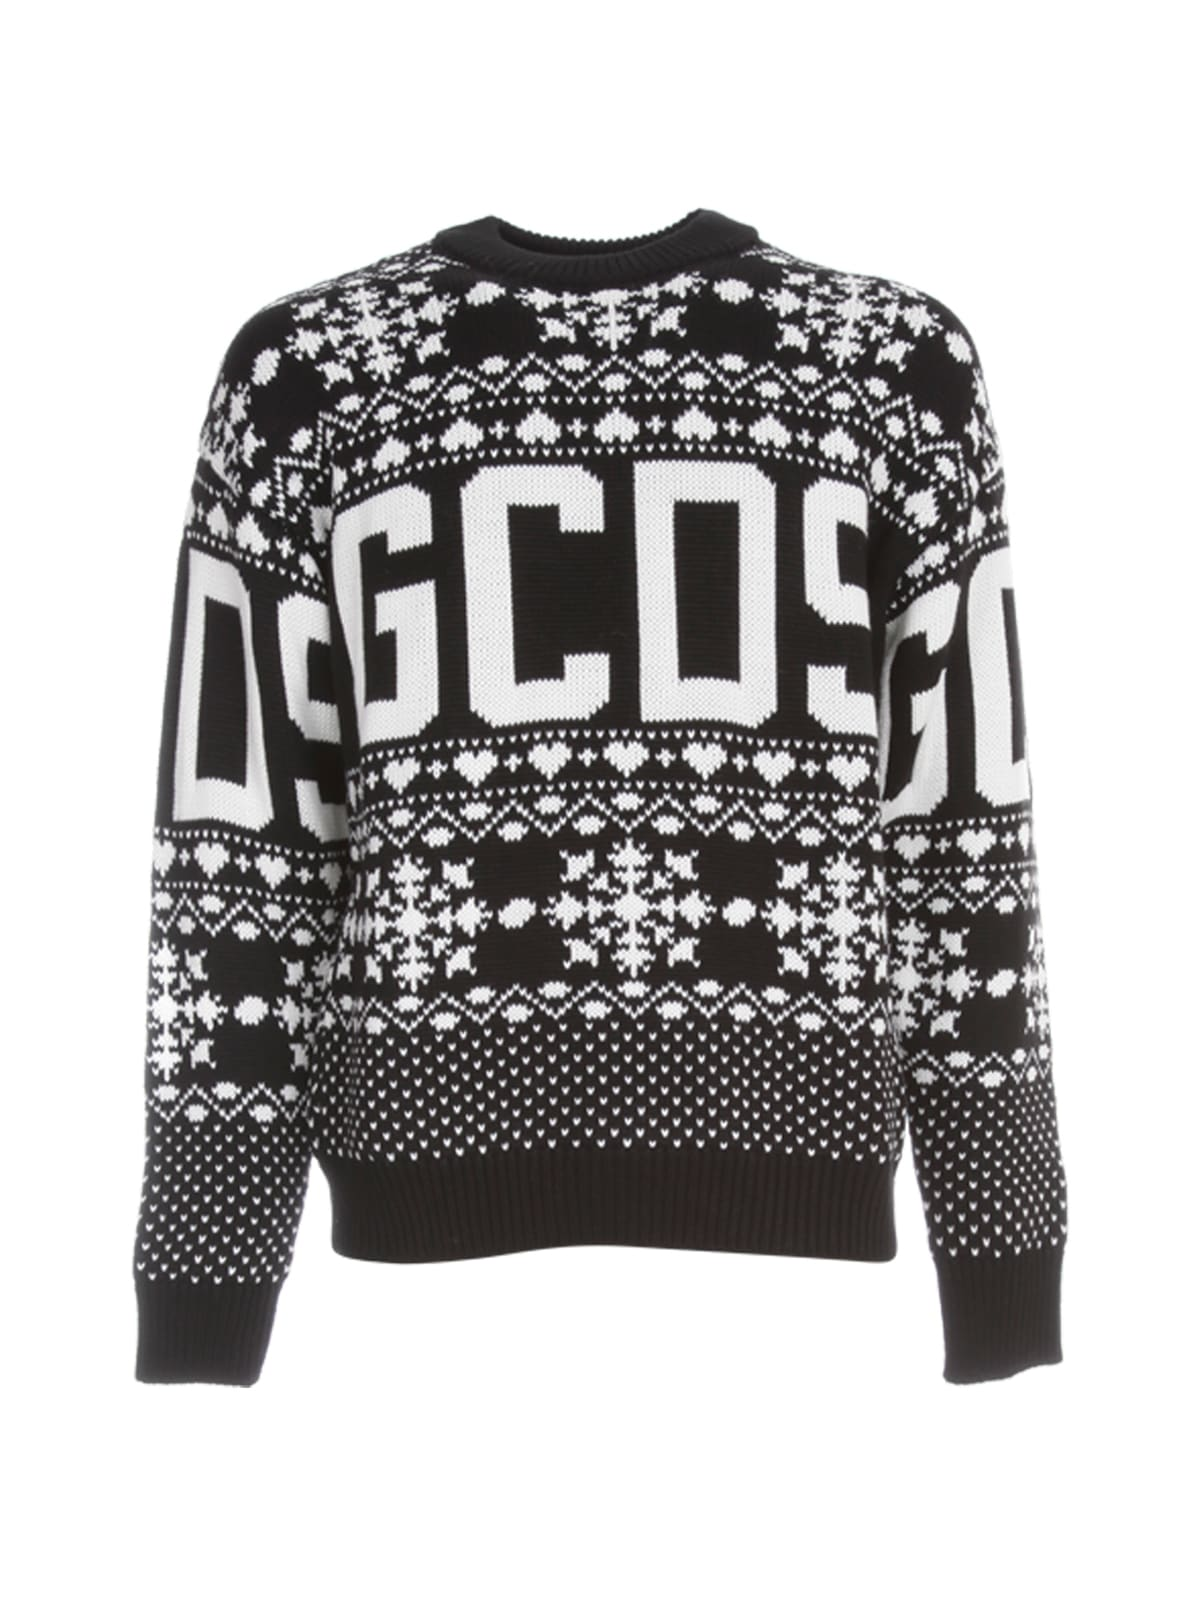 Gcds Sweaters CHRISTMAS SWEATER L/S CREW NECK